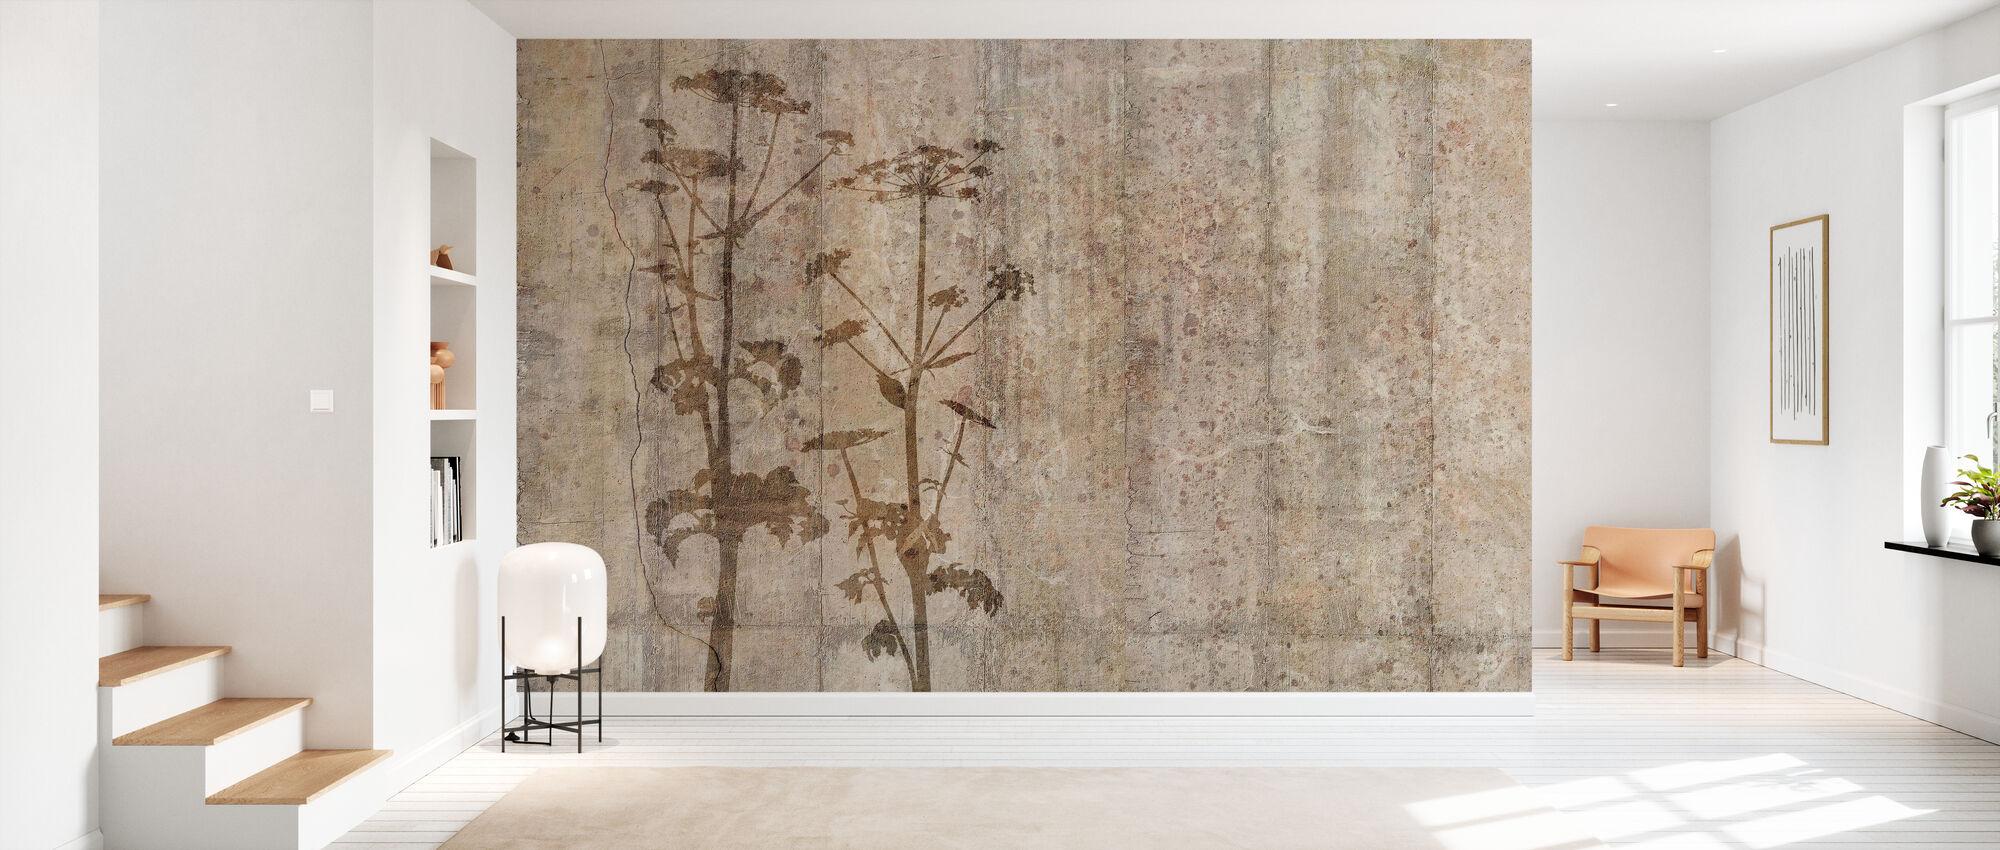 Riesen-Hogweed mit Betonwand - Tapete - Flur